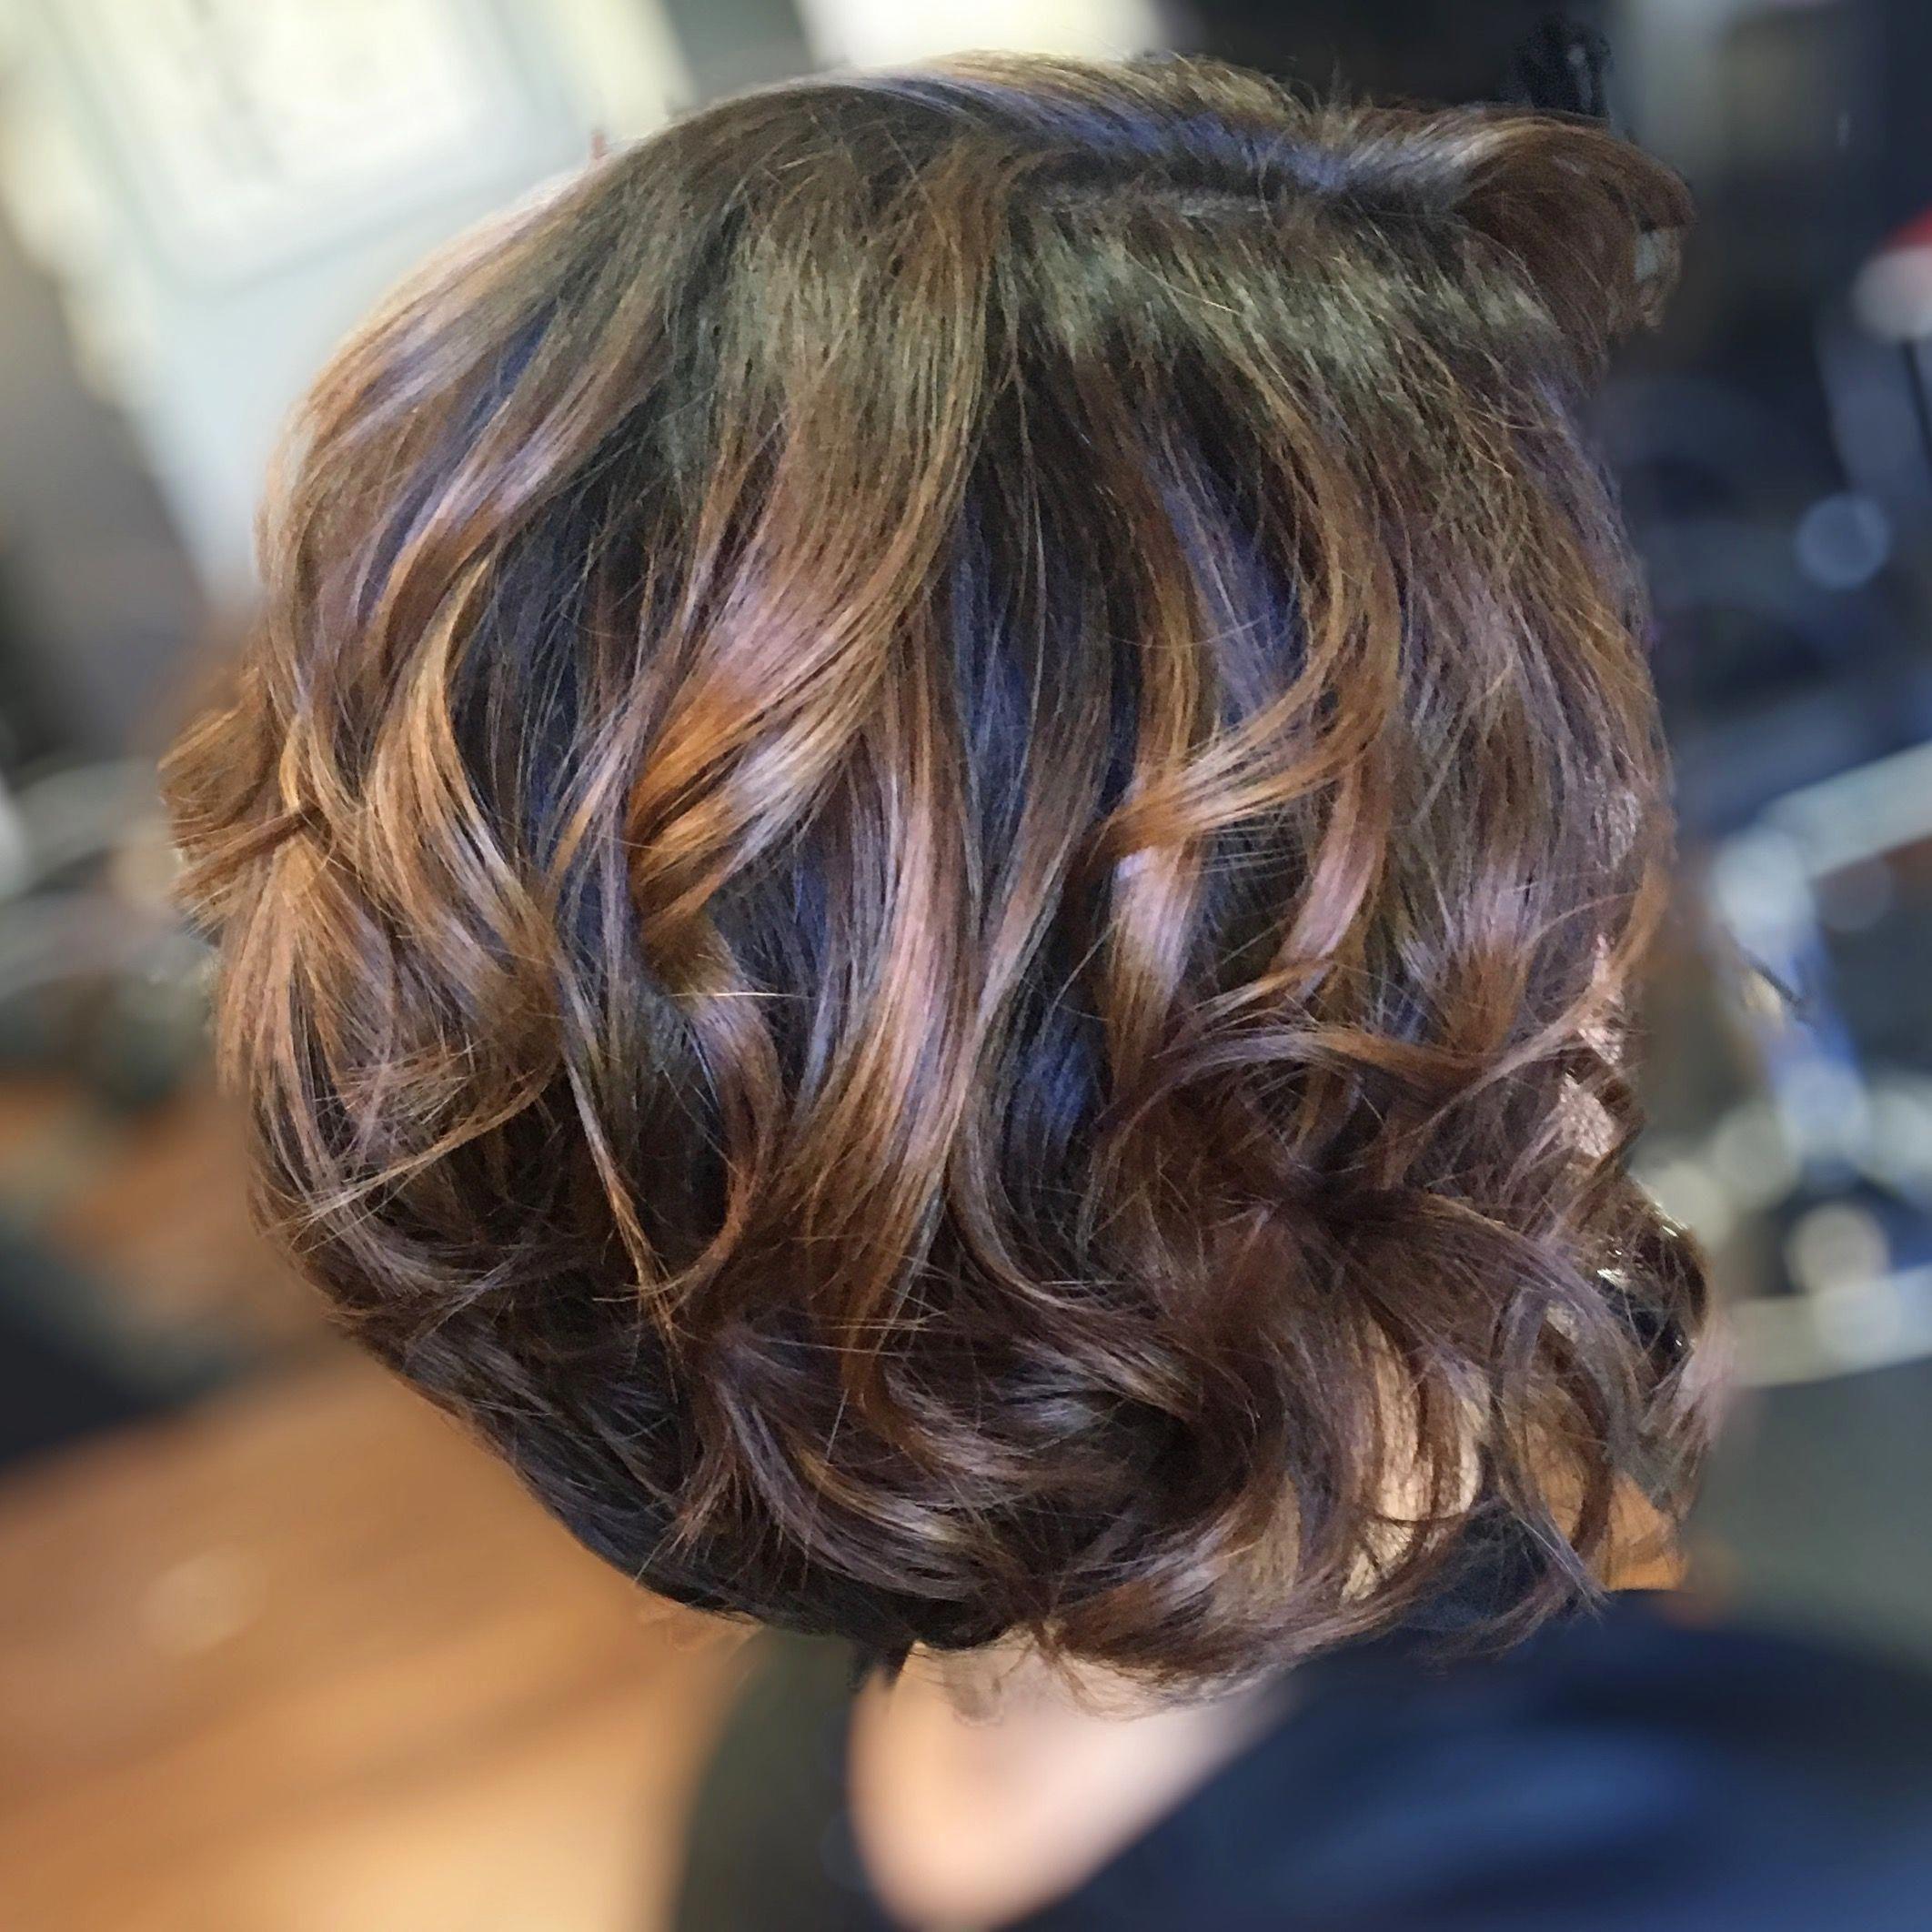 caramel balayage short hair #caramelbalayageshorthair